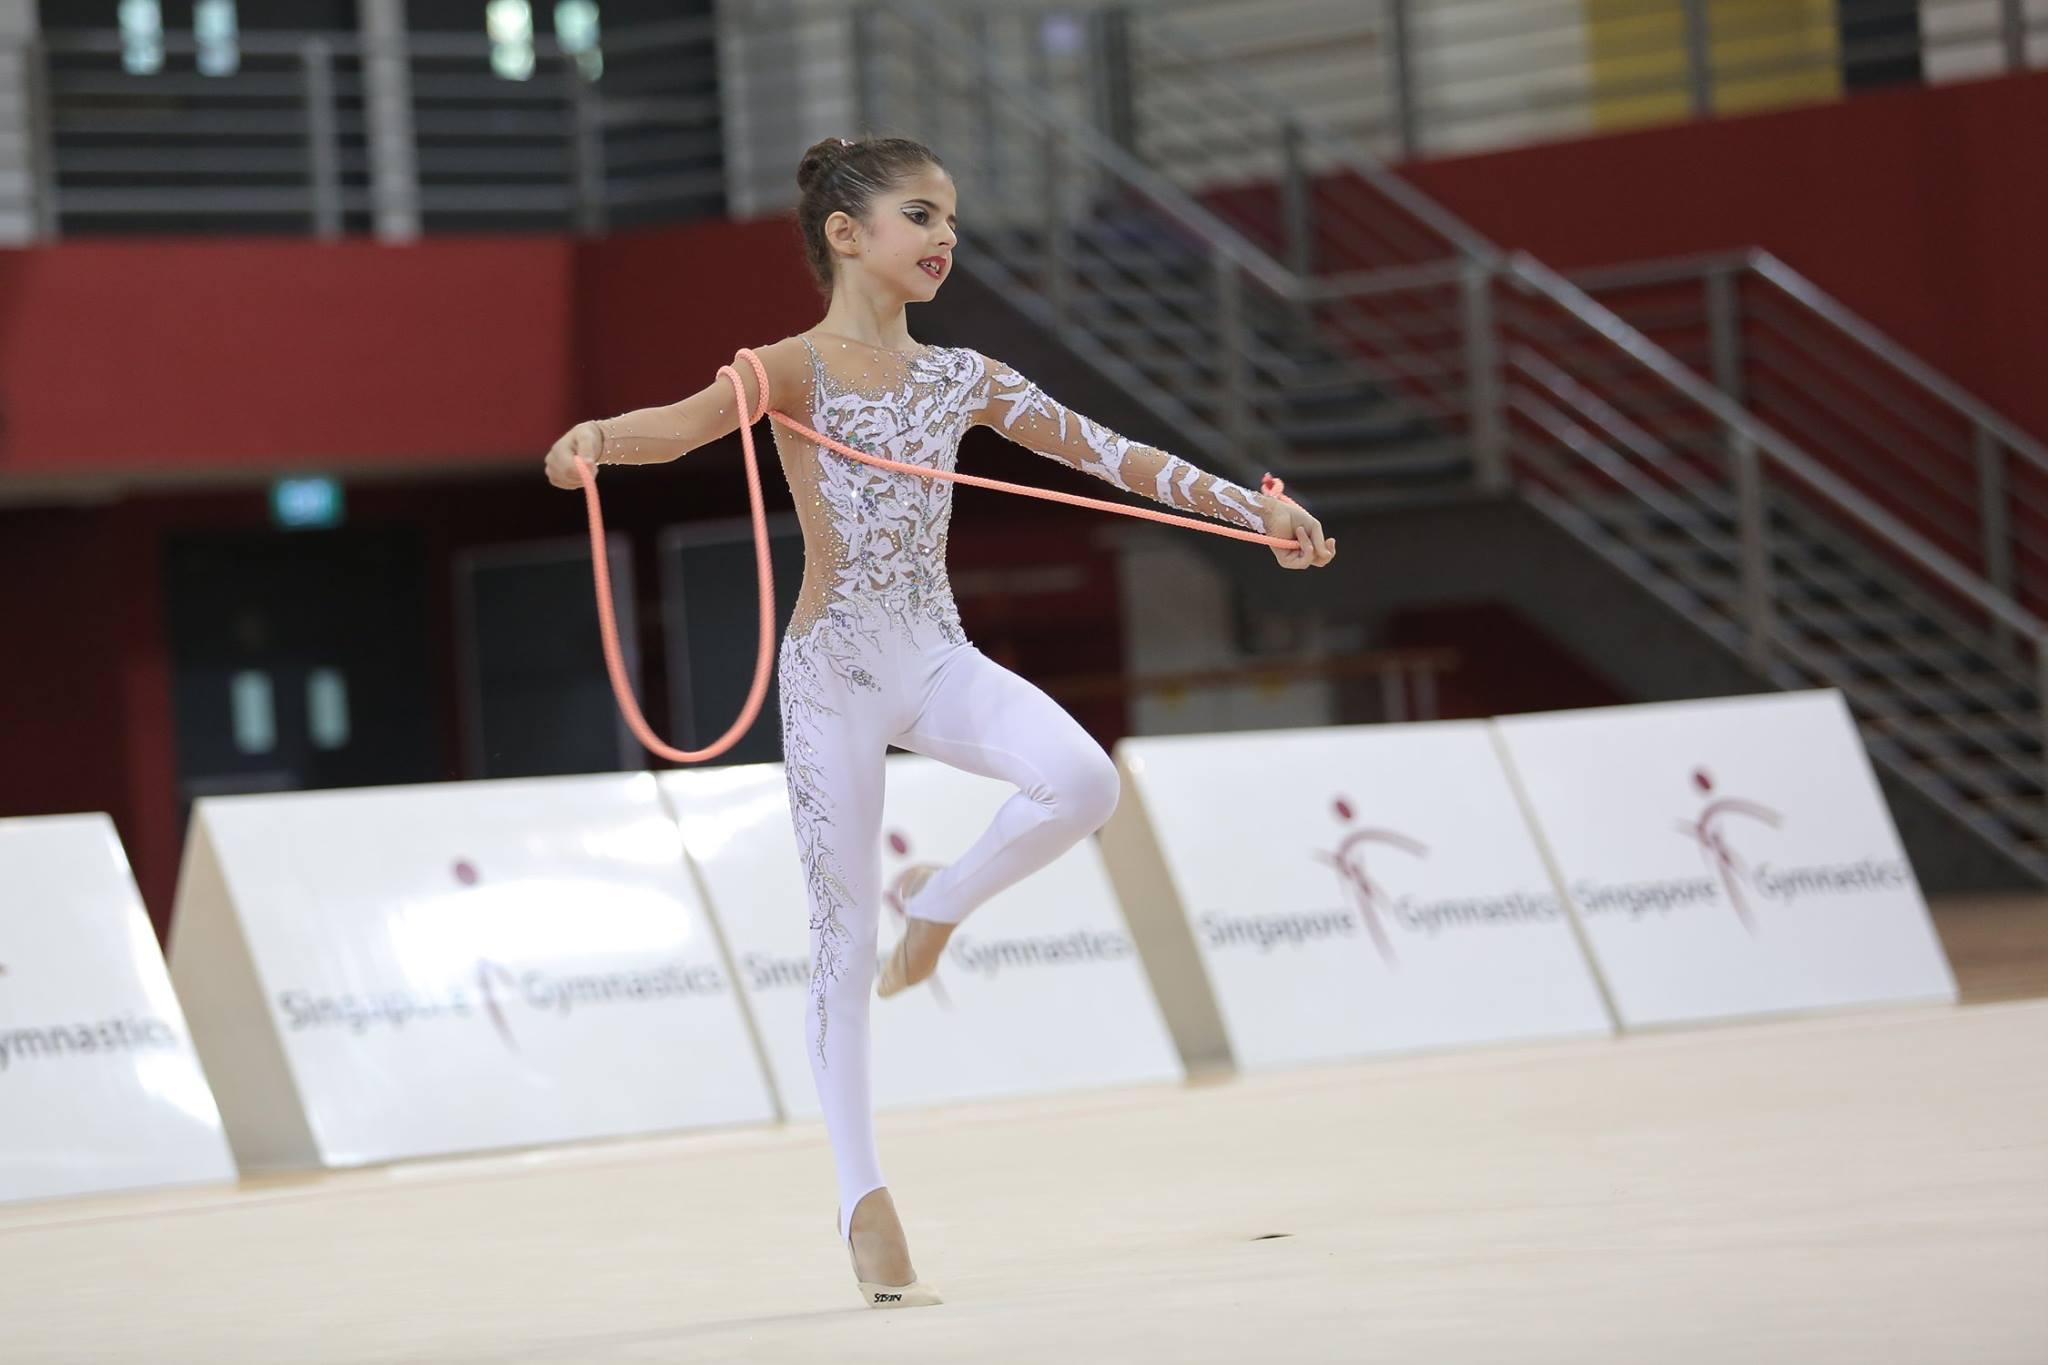 Singapore Gymnastics Open Championships 2017 23